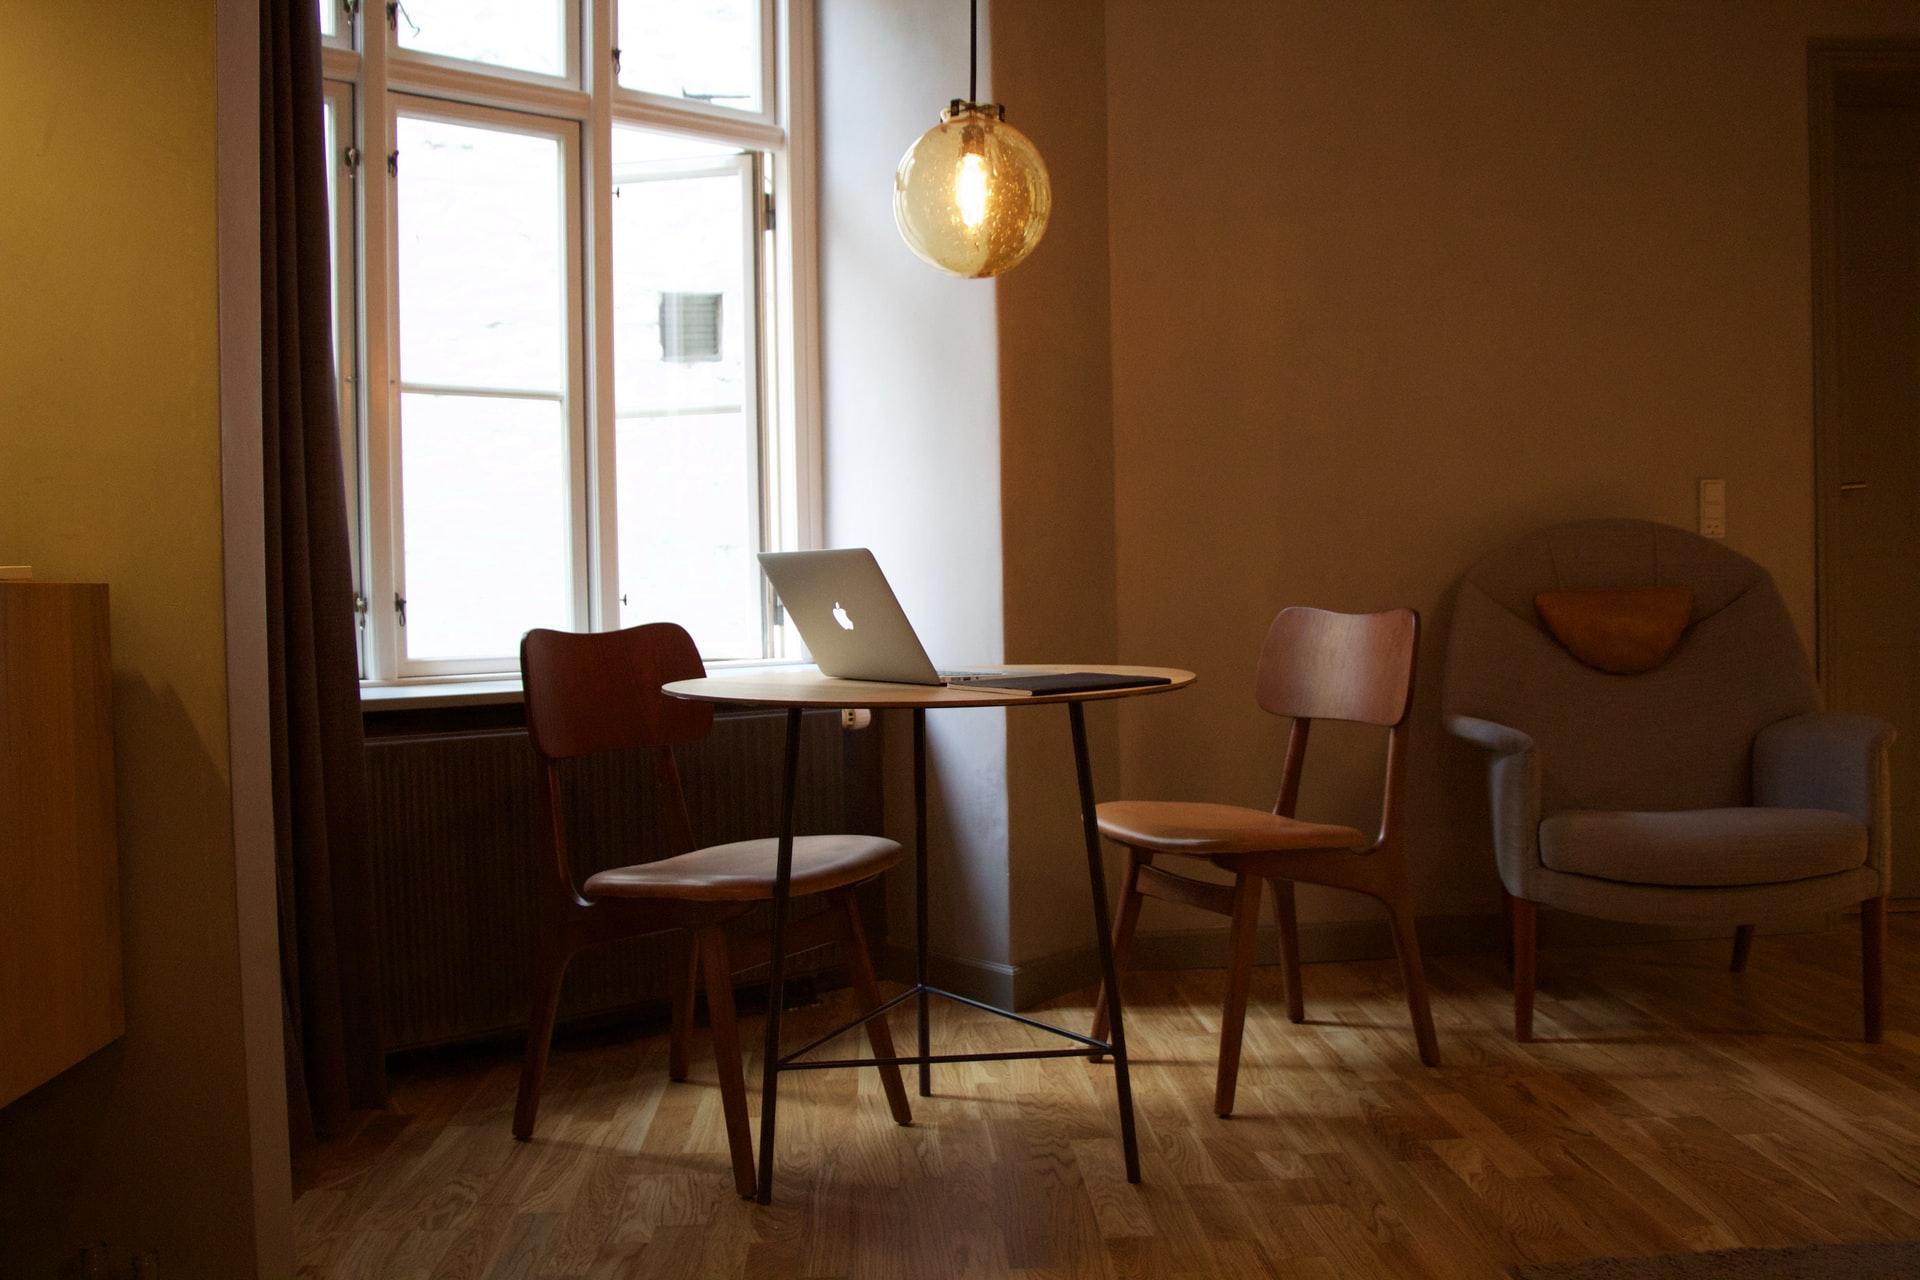 krzesła do domu